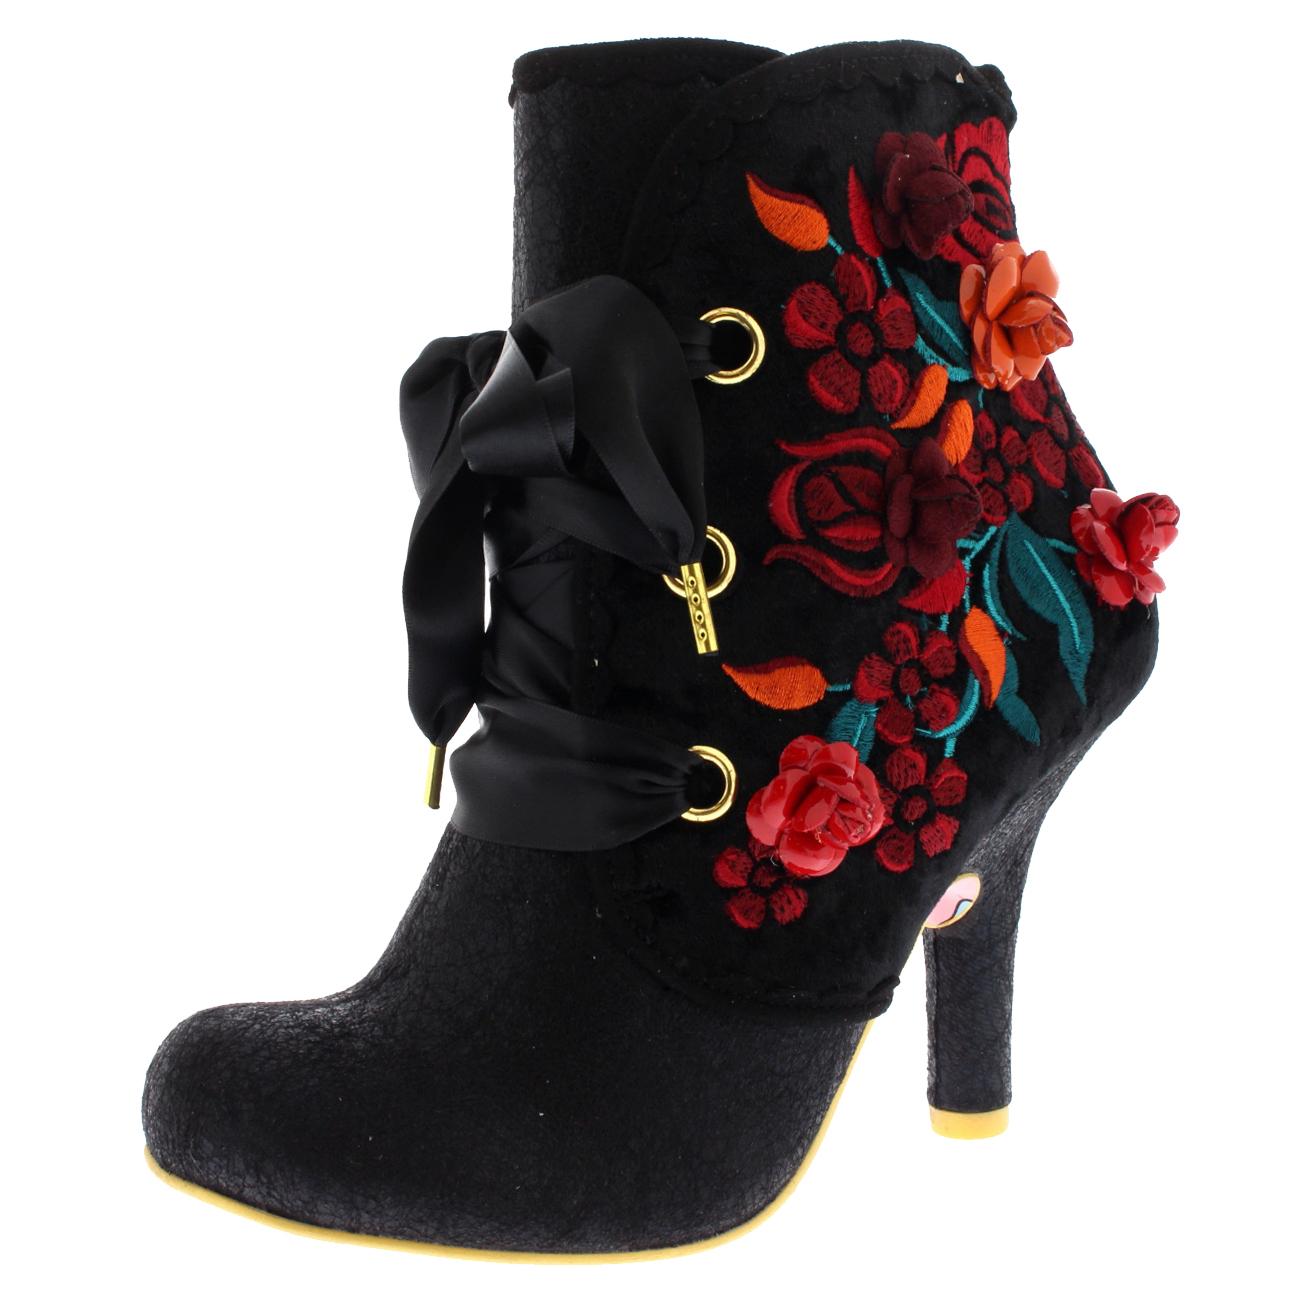 Womens Irregular Choice Butumn Harvest Floral Bnkle Boot High Heels UK 3.5-8.5